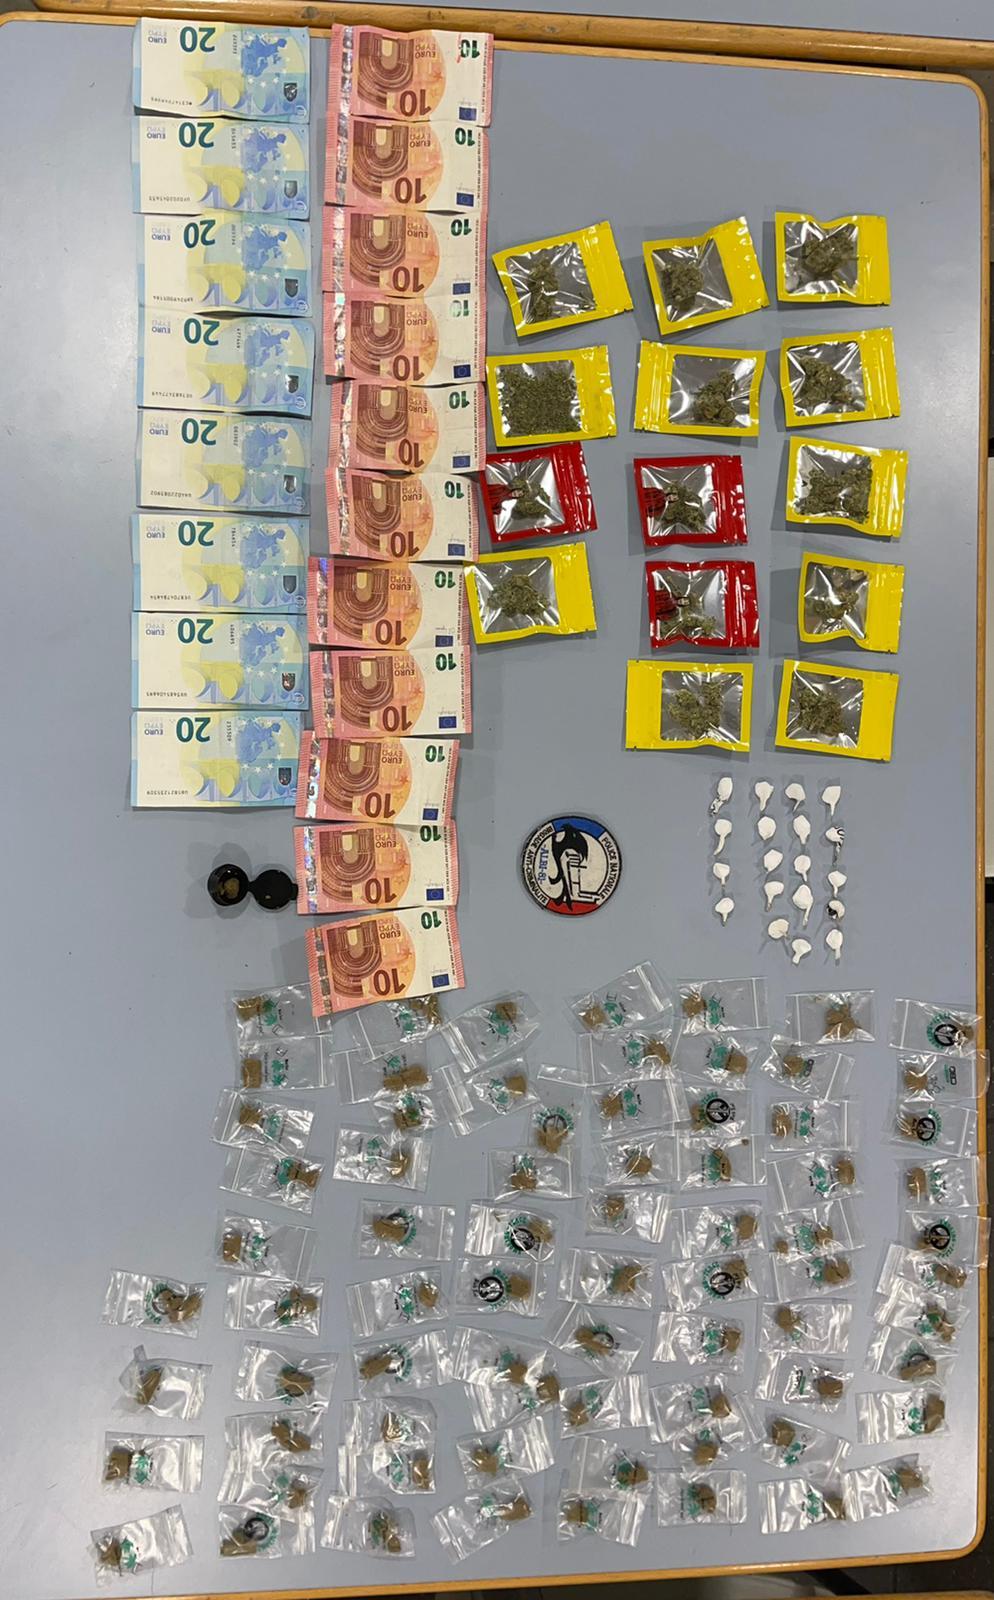 Cocaïne et cannabis saisies quartier Cantepau à Albi